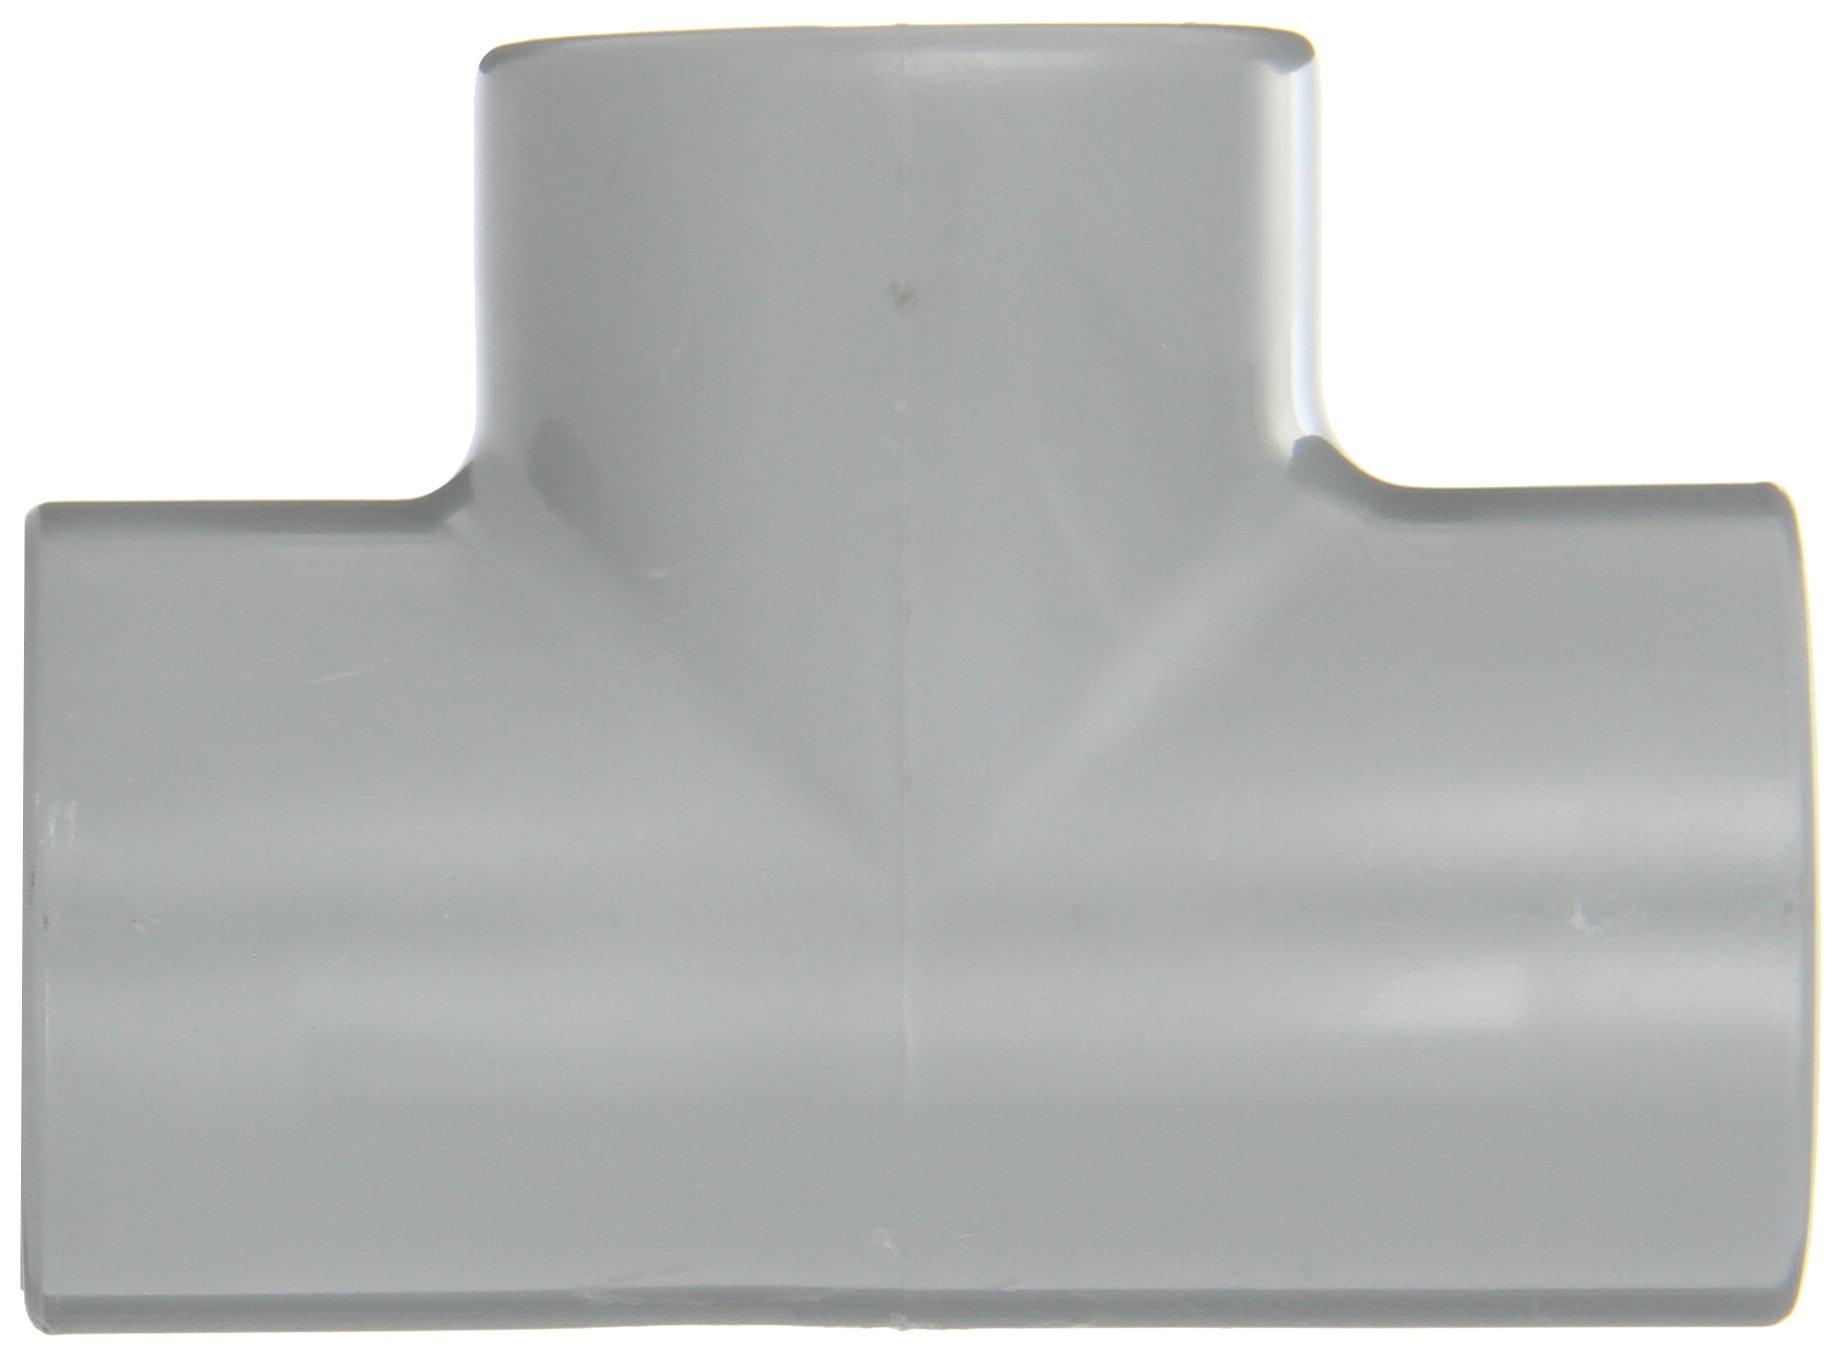 Cap 3 NPT Female Schedule 80 Spears 848 Series PVC Pipe Fitting